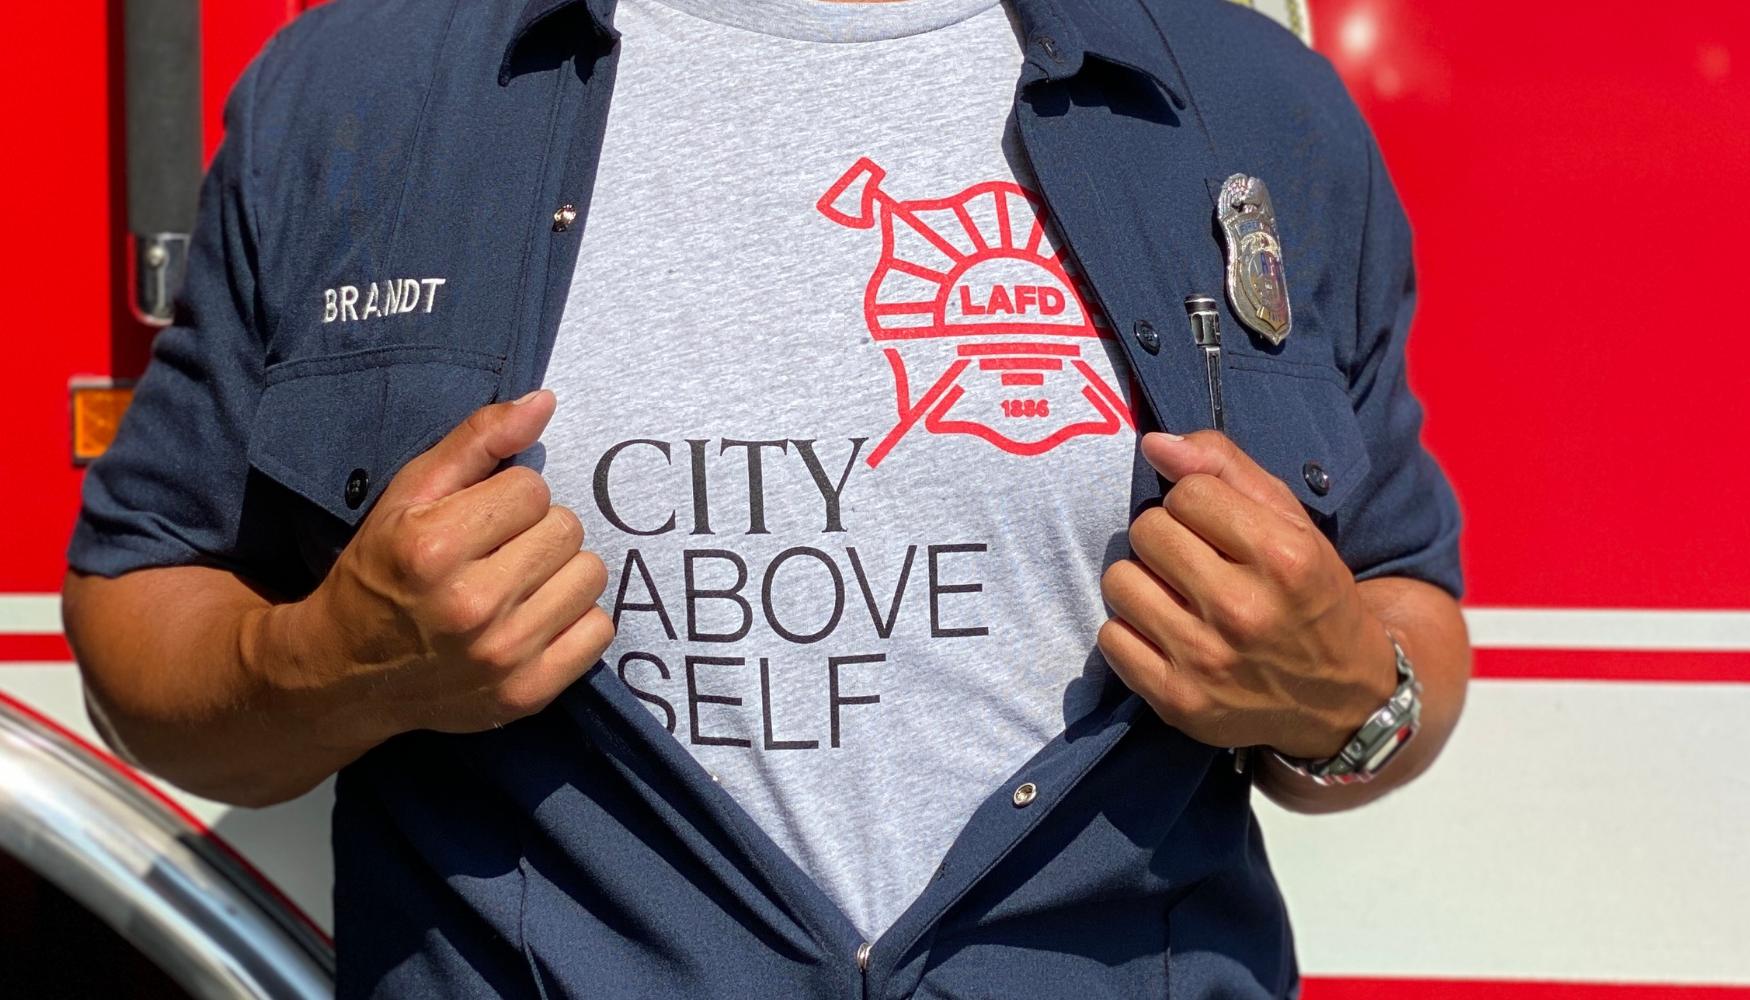 City Above Self